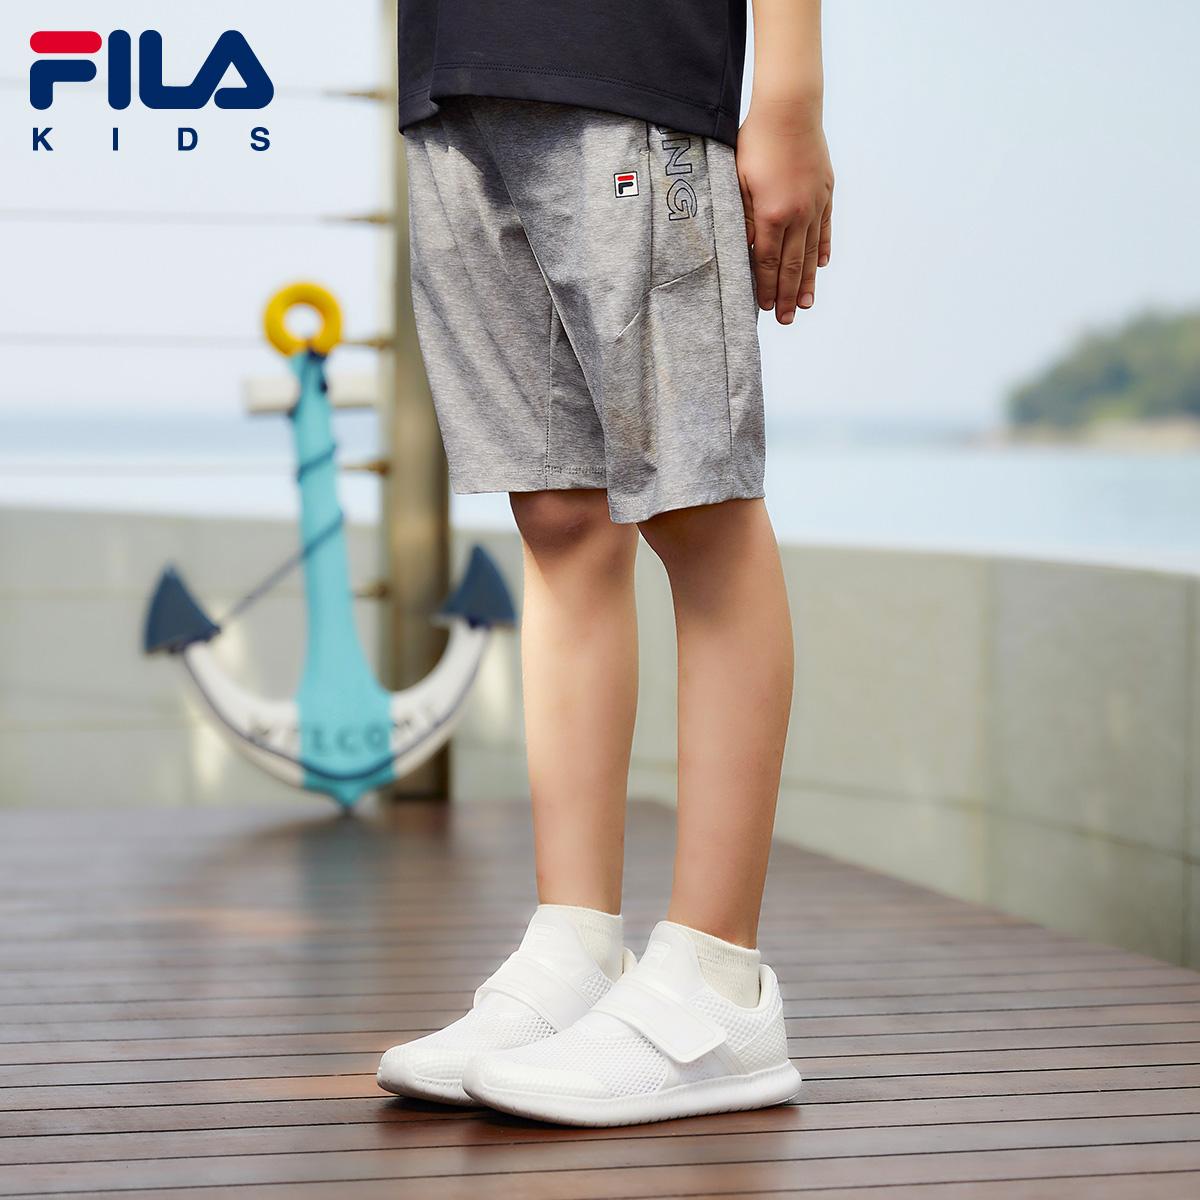 FILA斐乐童装夏季新款男童裤子时尚休闲柔软透气梭织五分裤2018